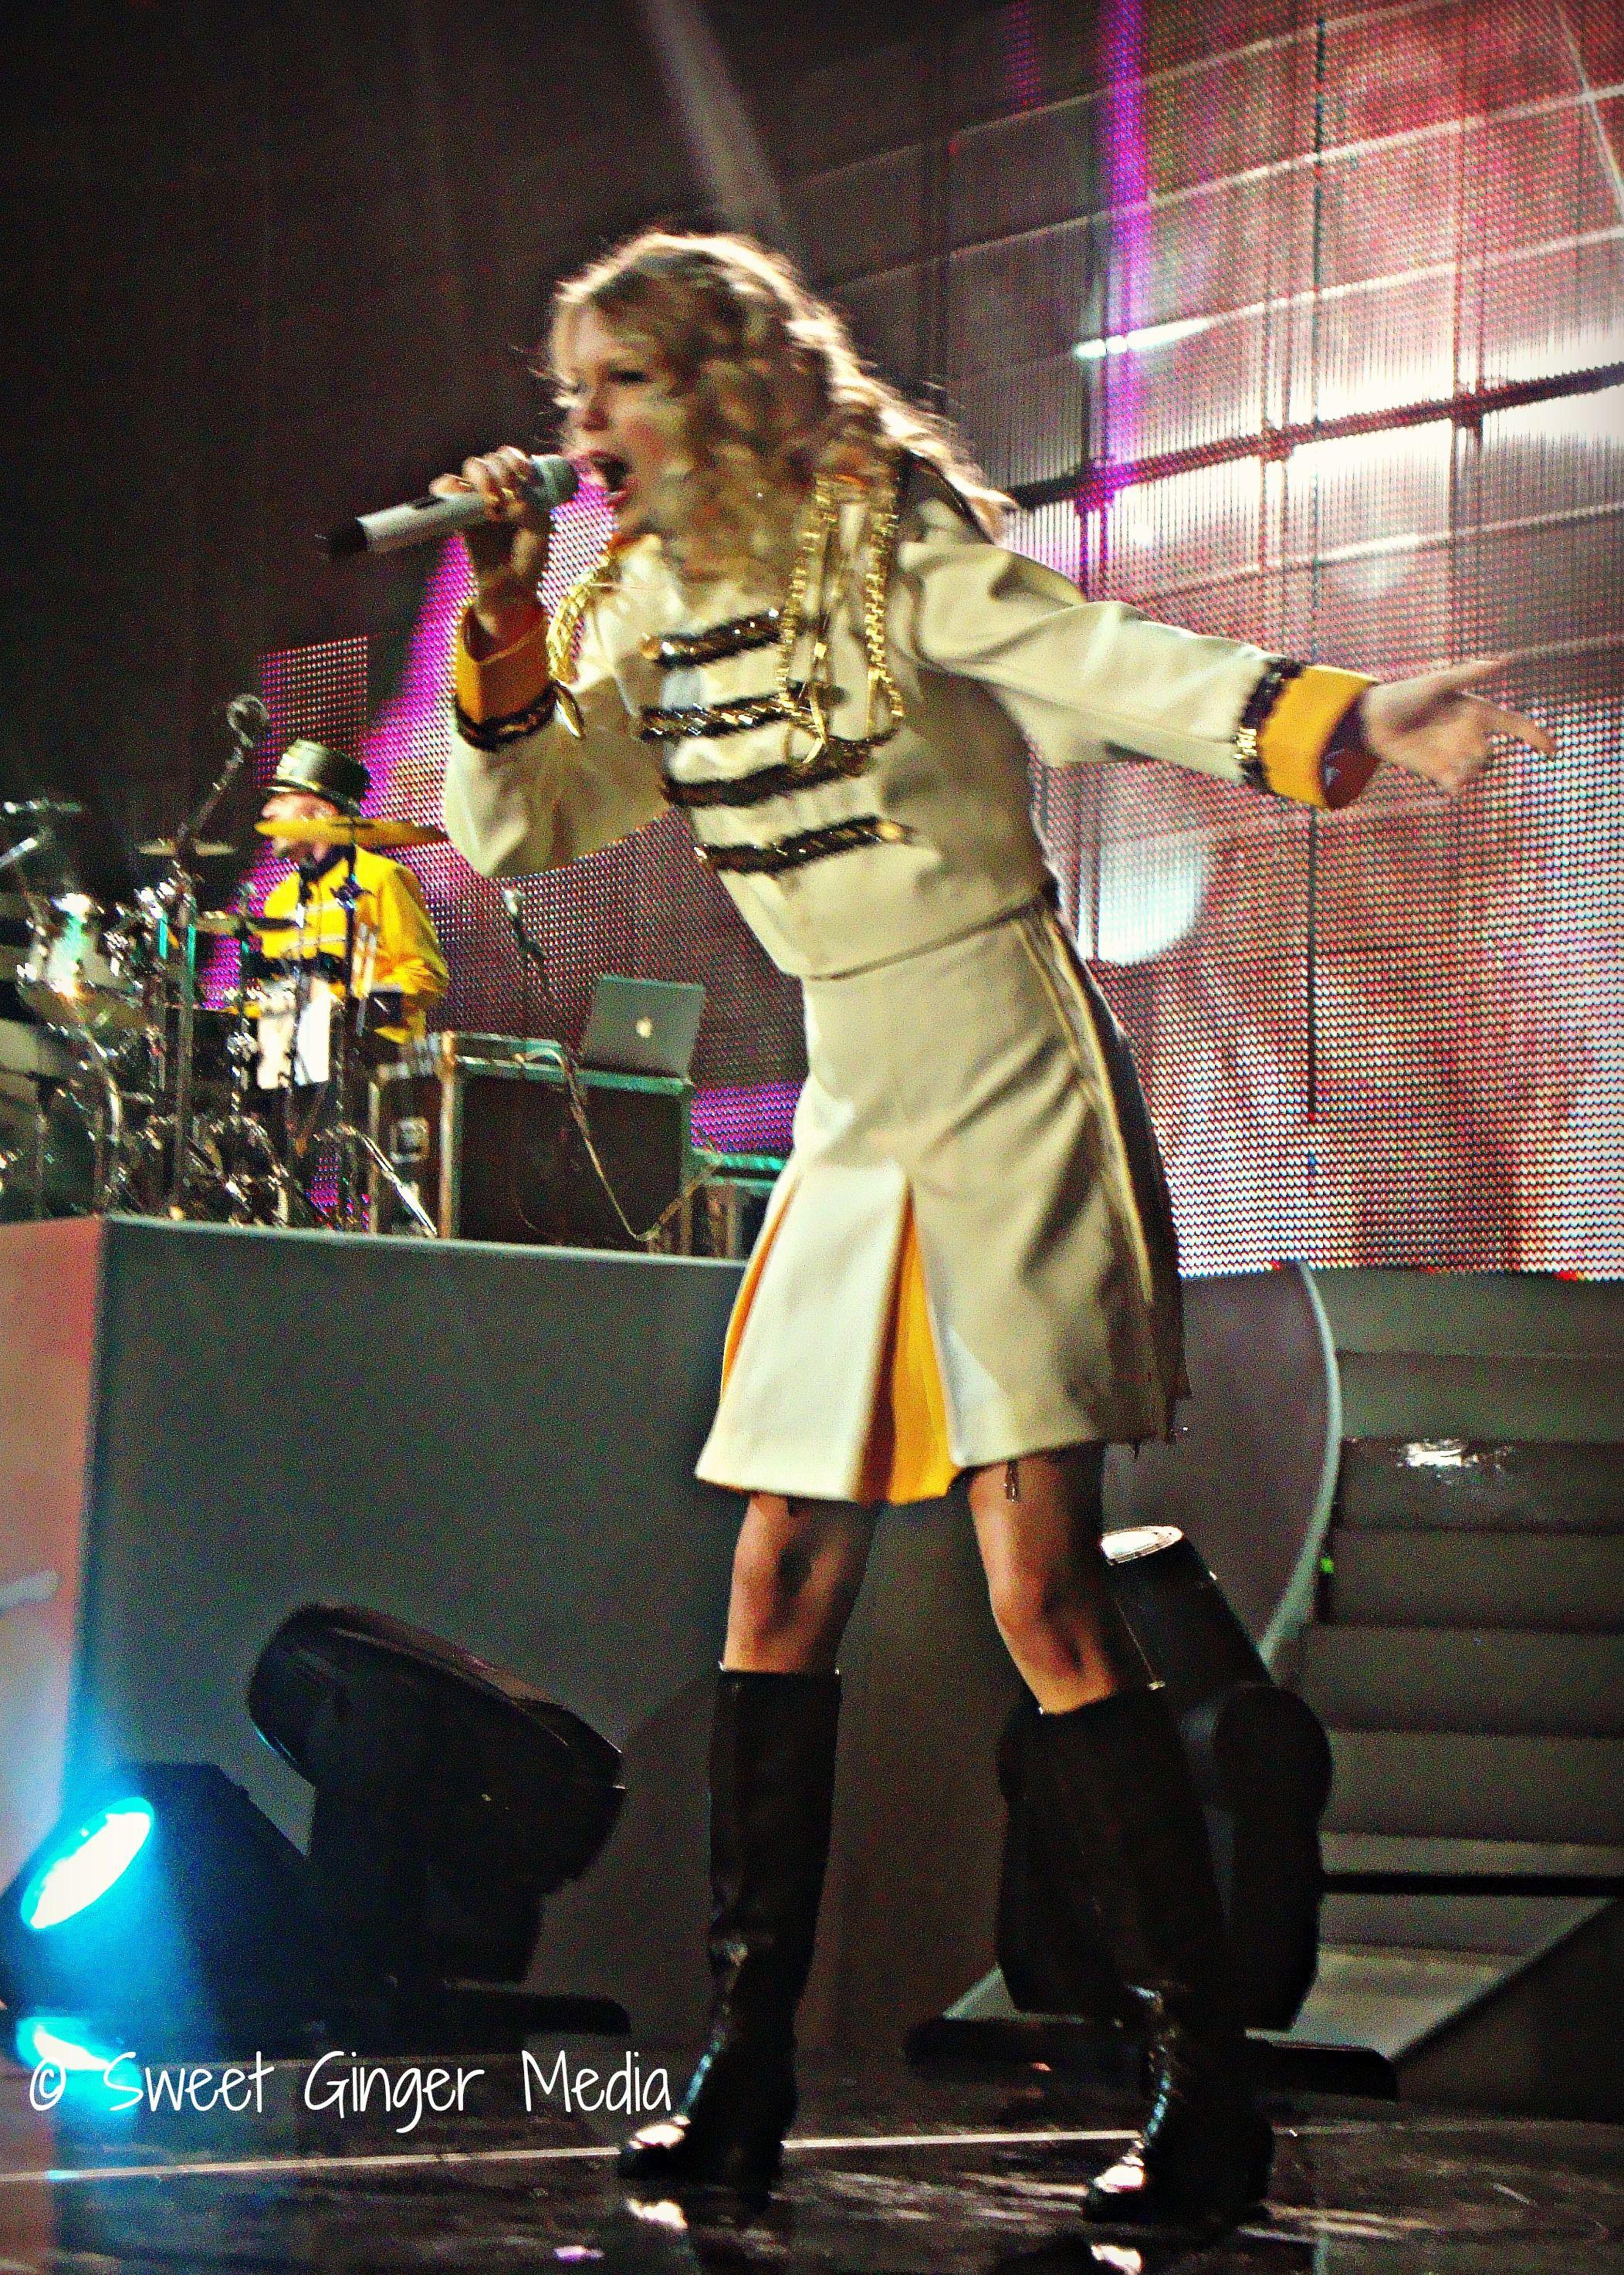 #TaylorSwift #LiveMusic #Pittsburgh #Photography #SweetGingerMedia